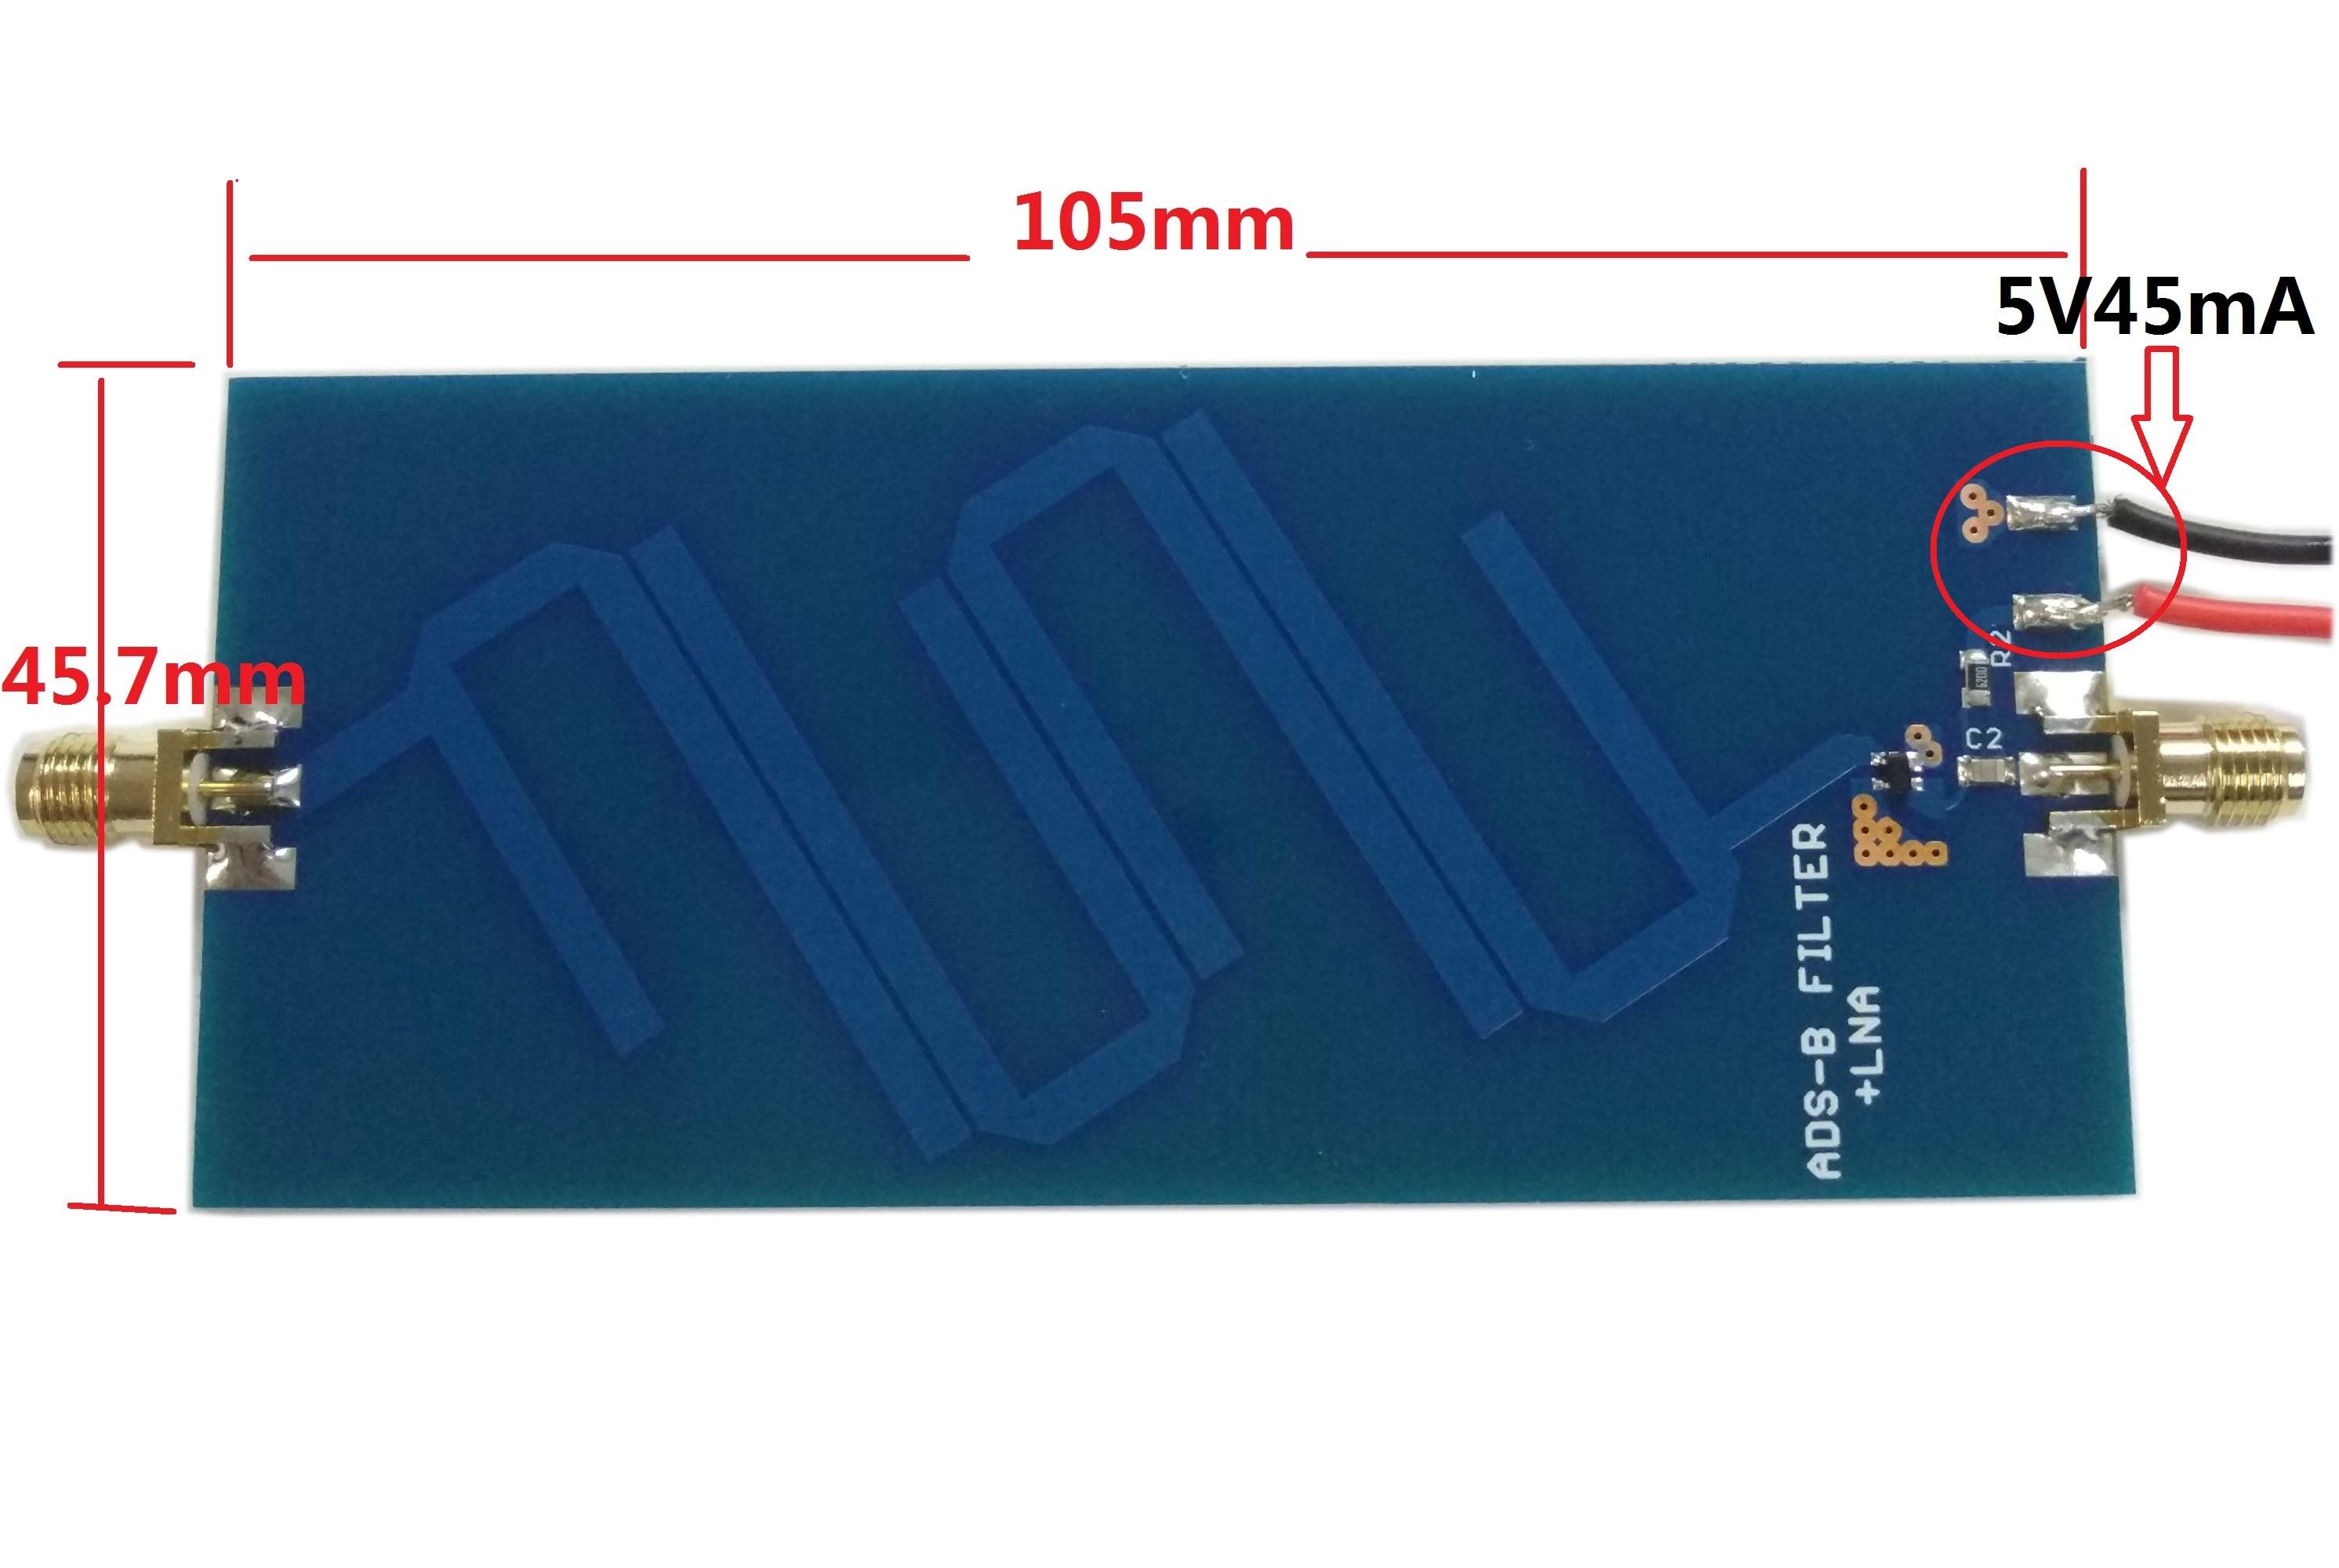 ADS-B + LAN Filter ADS-B 1090 MHz Bandpass Filter